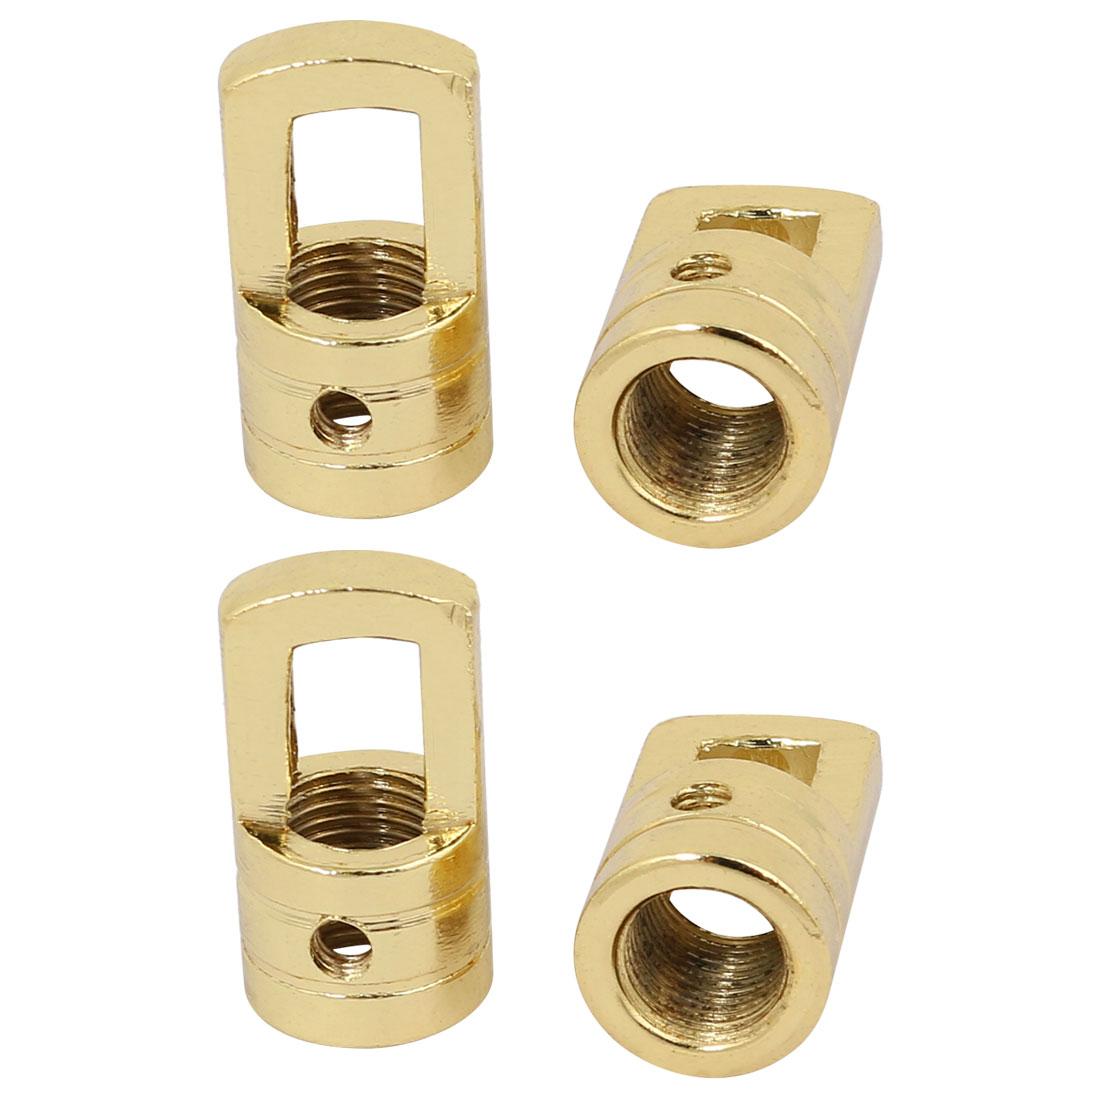 4pcs 15mm x 27mm M10 Female Thread Lamp Loop Ring Golden for DIY Chandelier